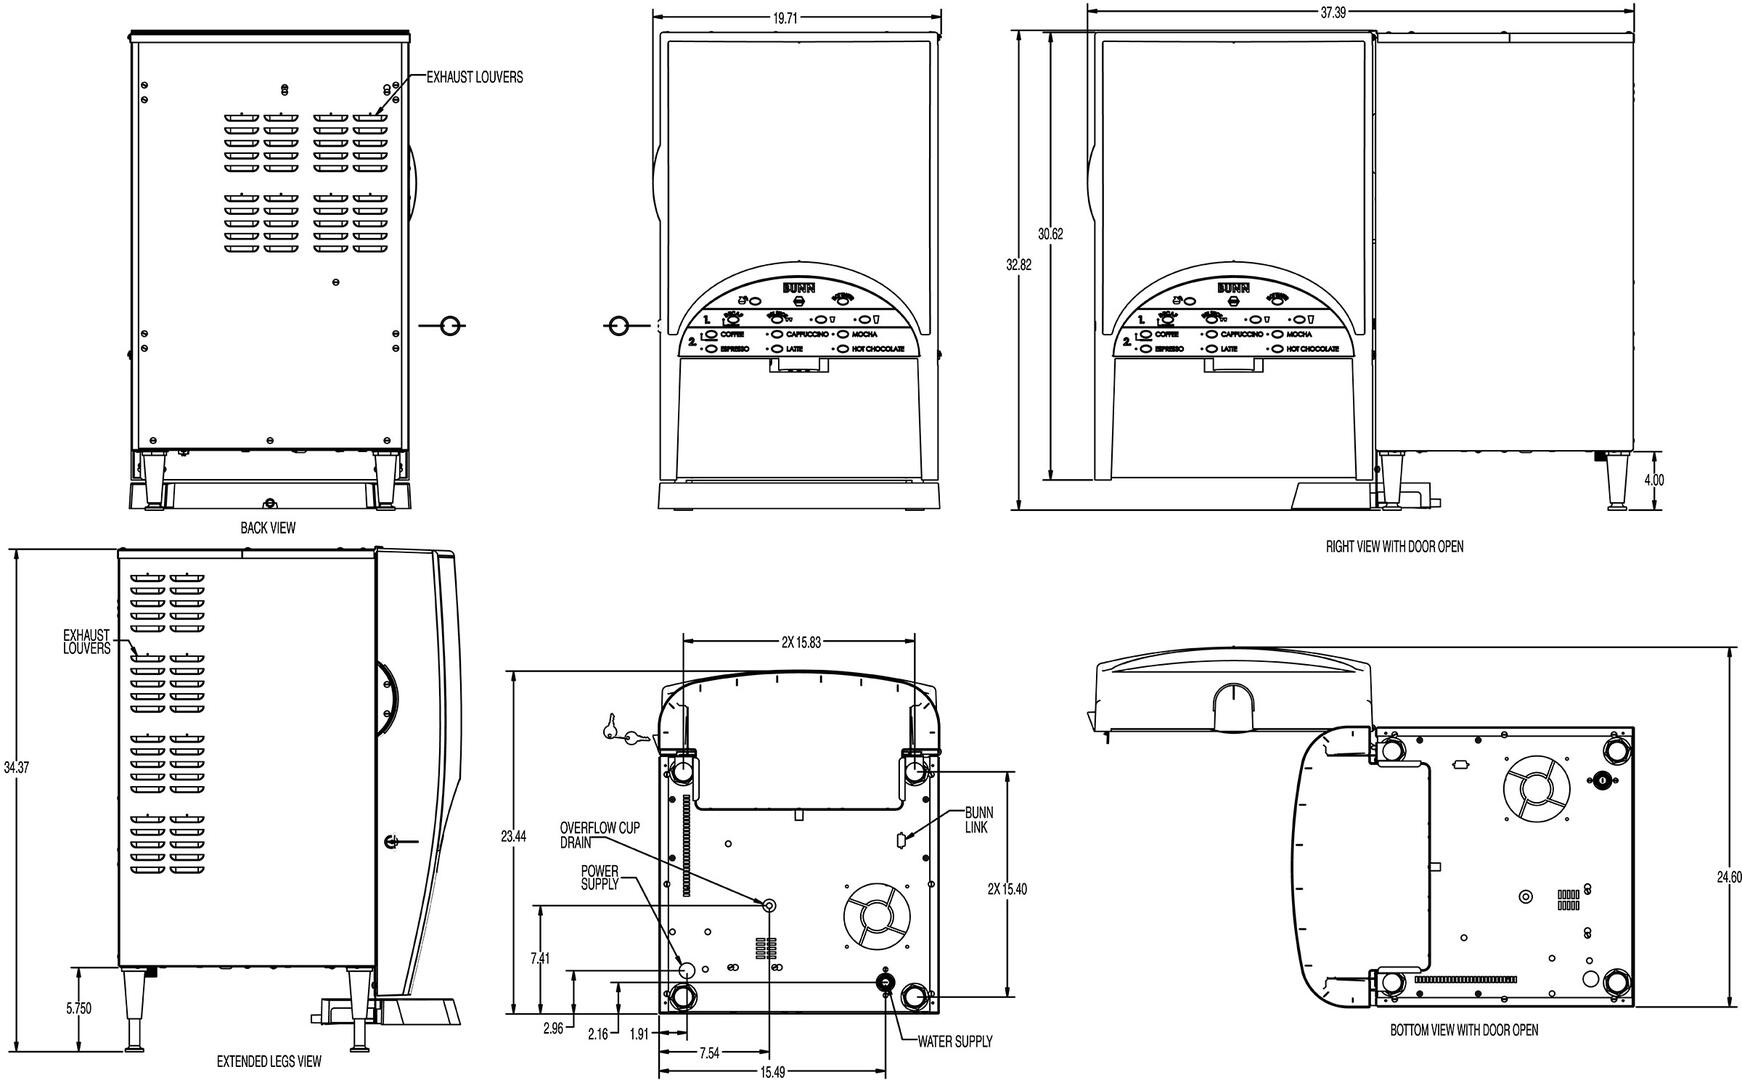 Bunn O Matic 389000305 197 Inch Countertop Coffee And Tea Brewing Model Bx Wiring Diagram Dimension